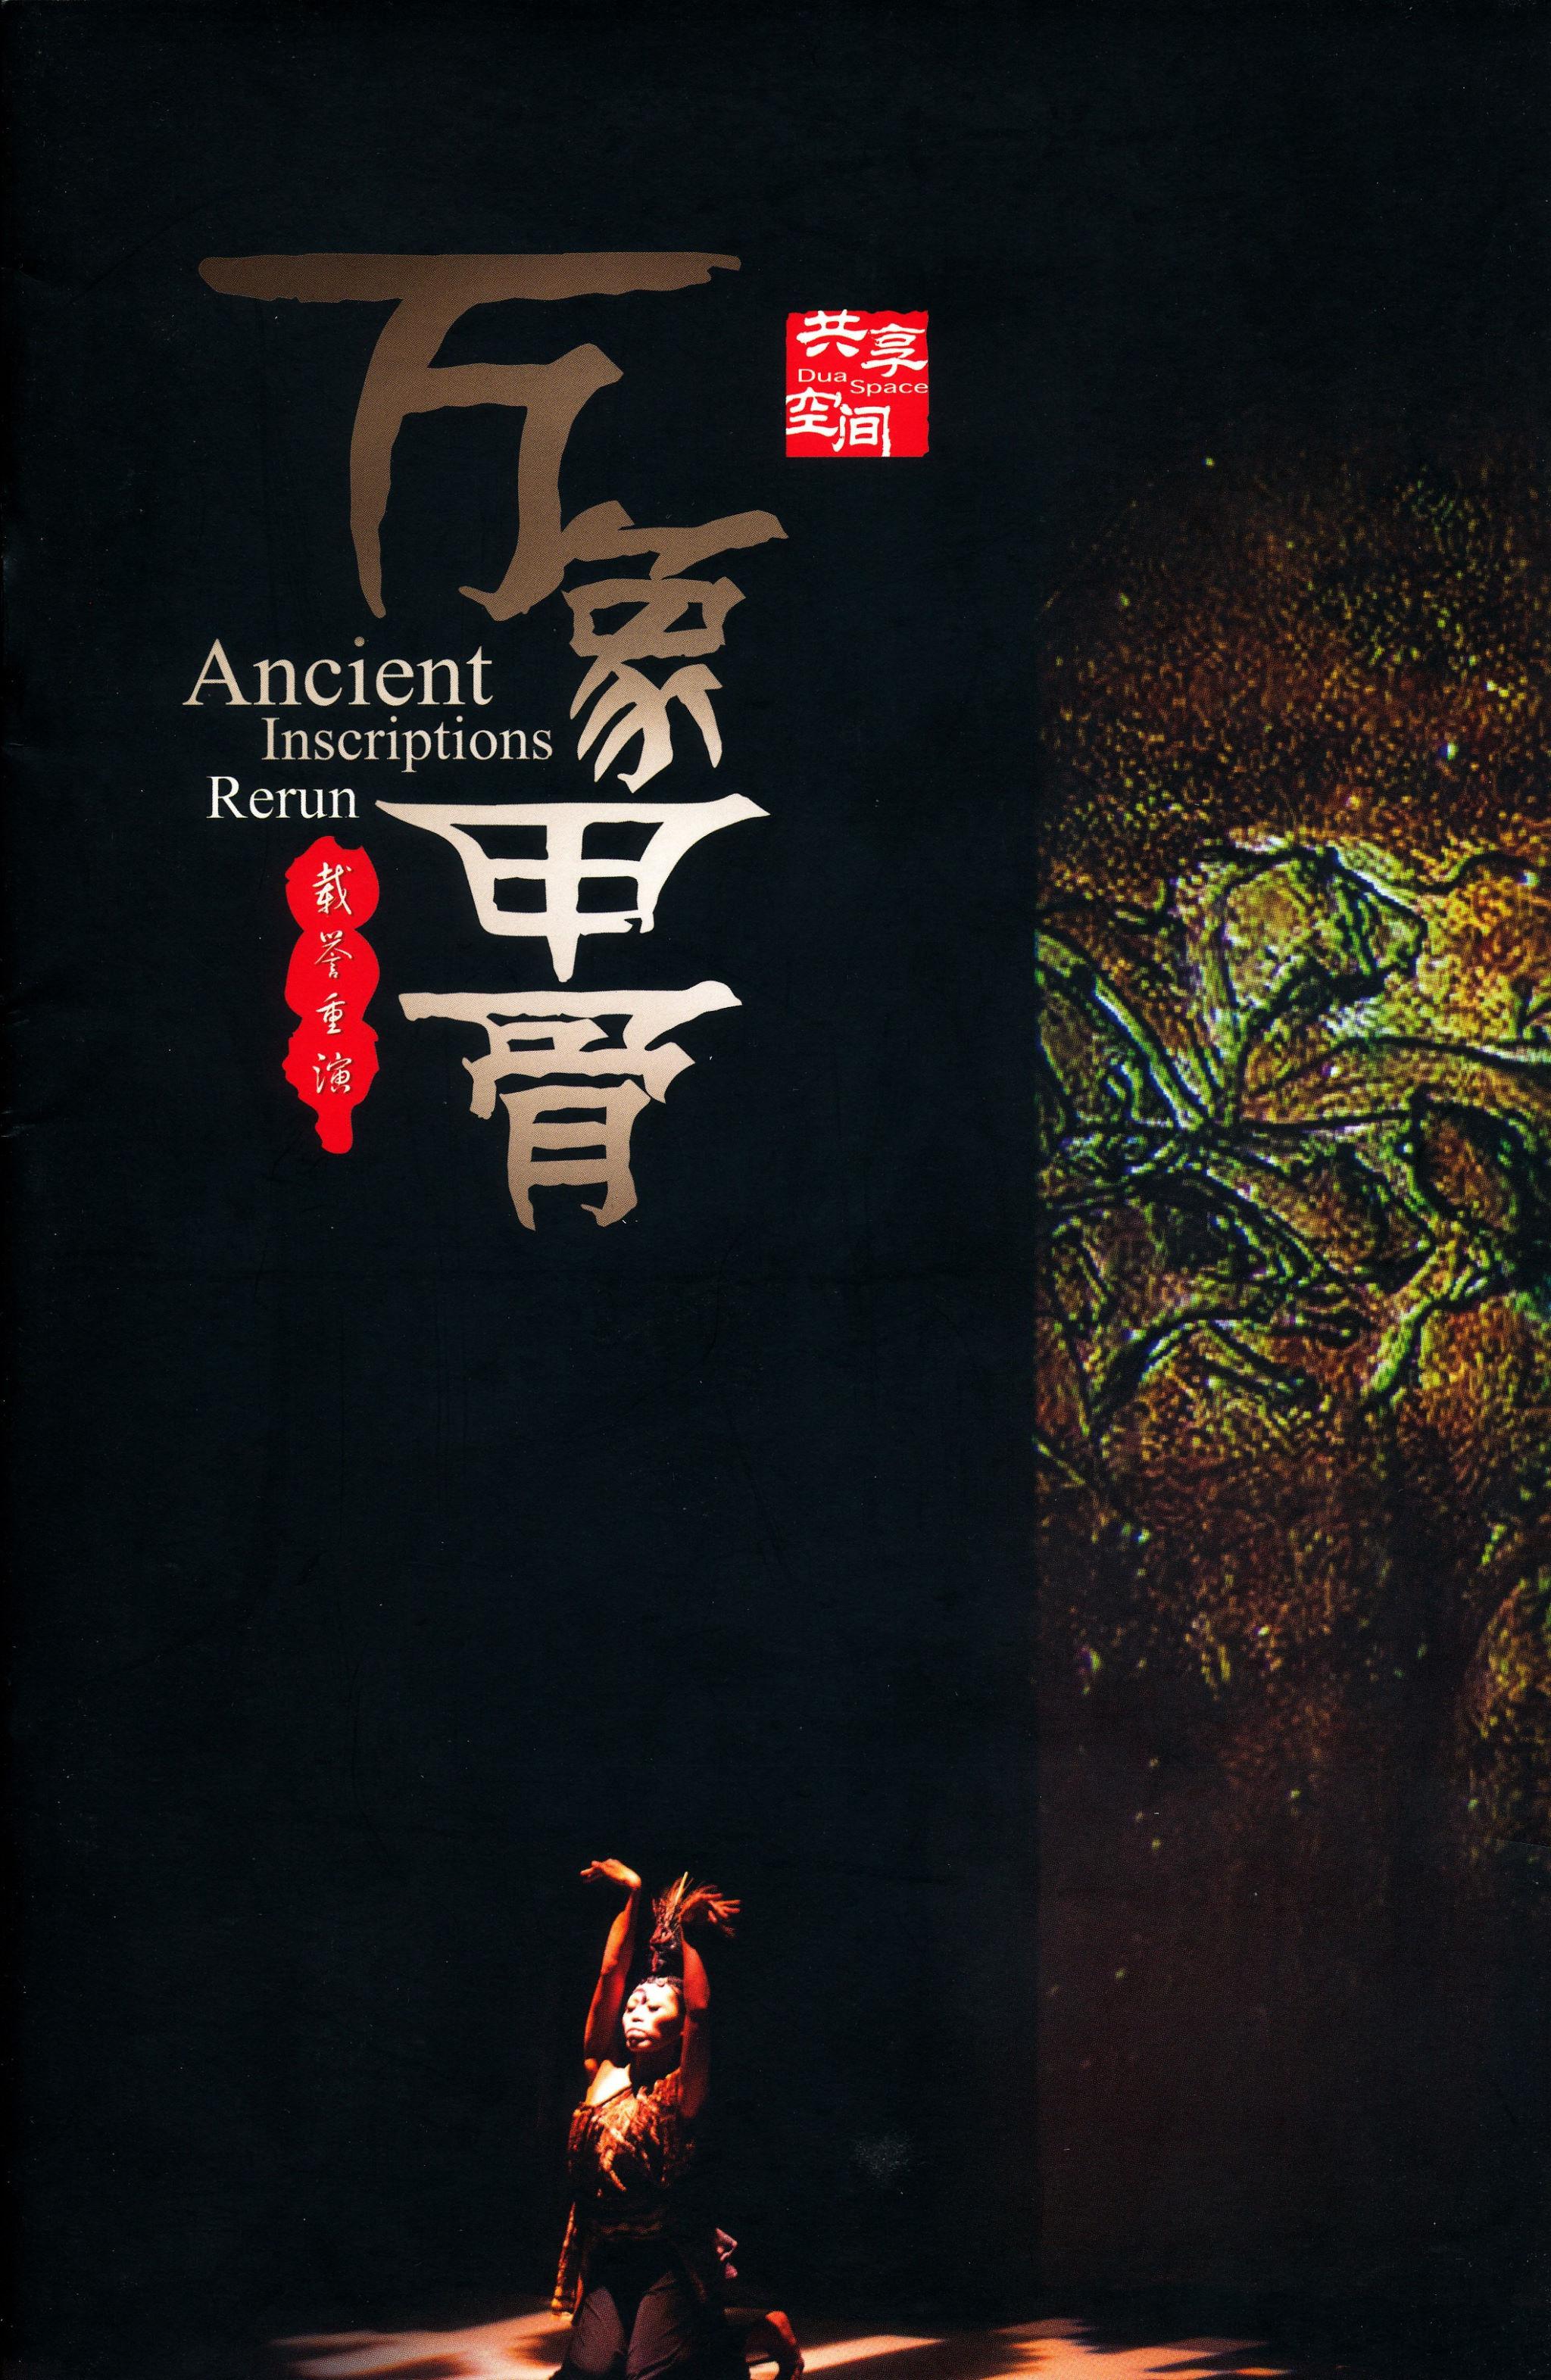 2014 Ancient Inscriptions Rerun Cover